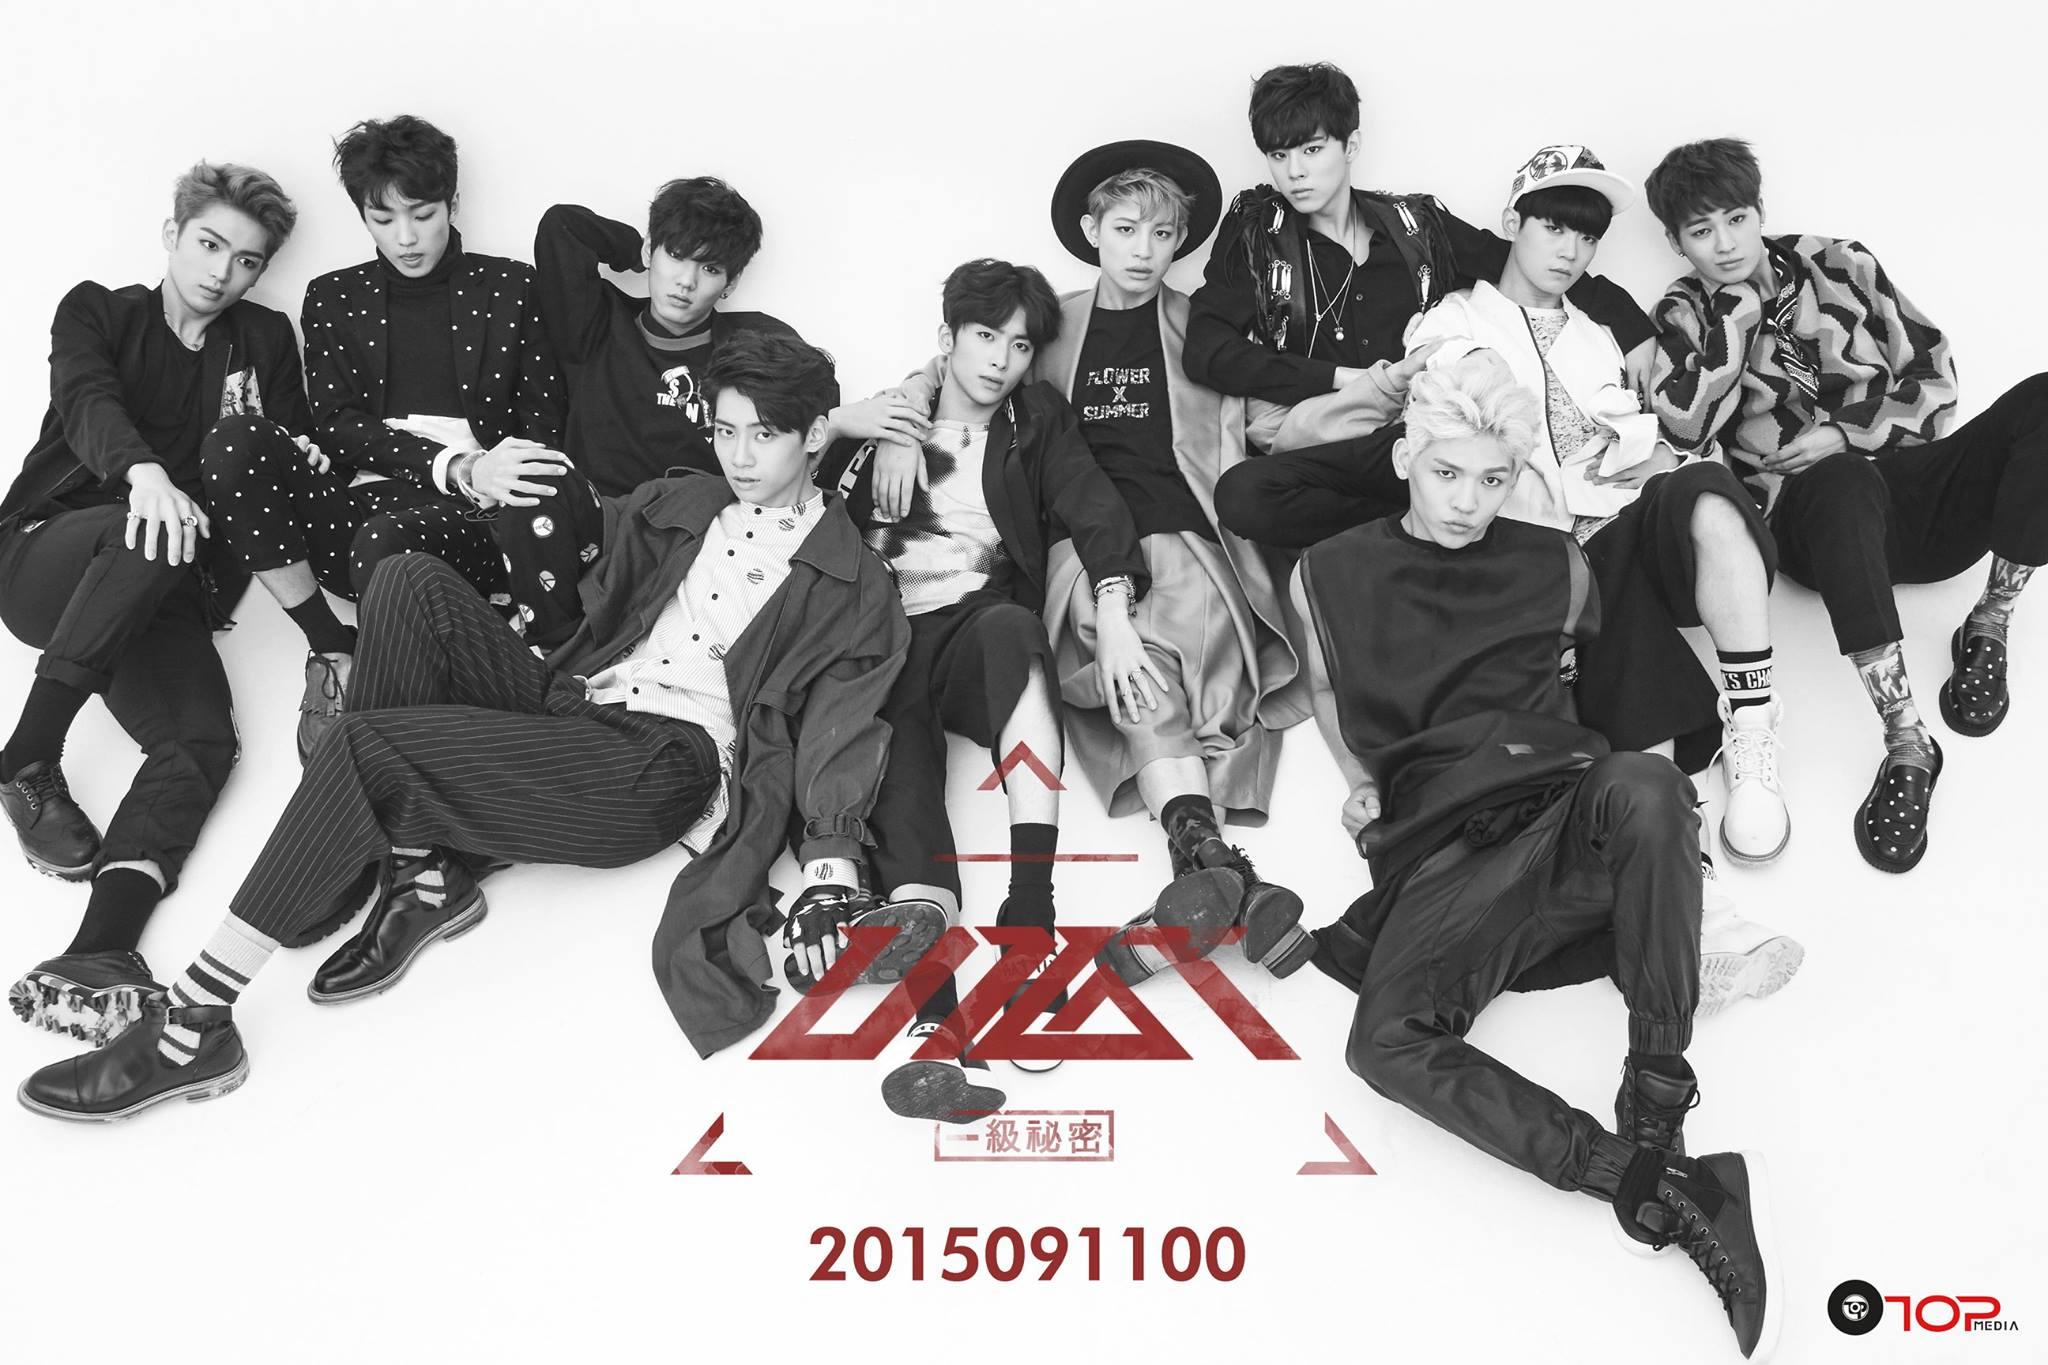 TOP 6. UP10TION 首張迷你專輯《一級秘密》(2015/09/11) 專輯銷量: 15,005張